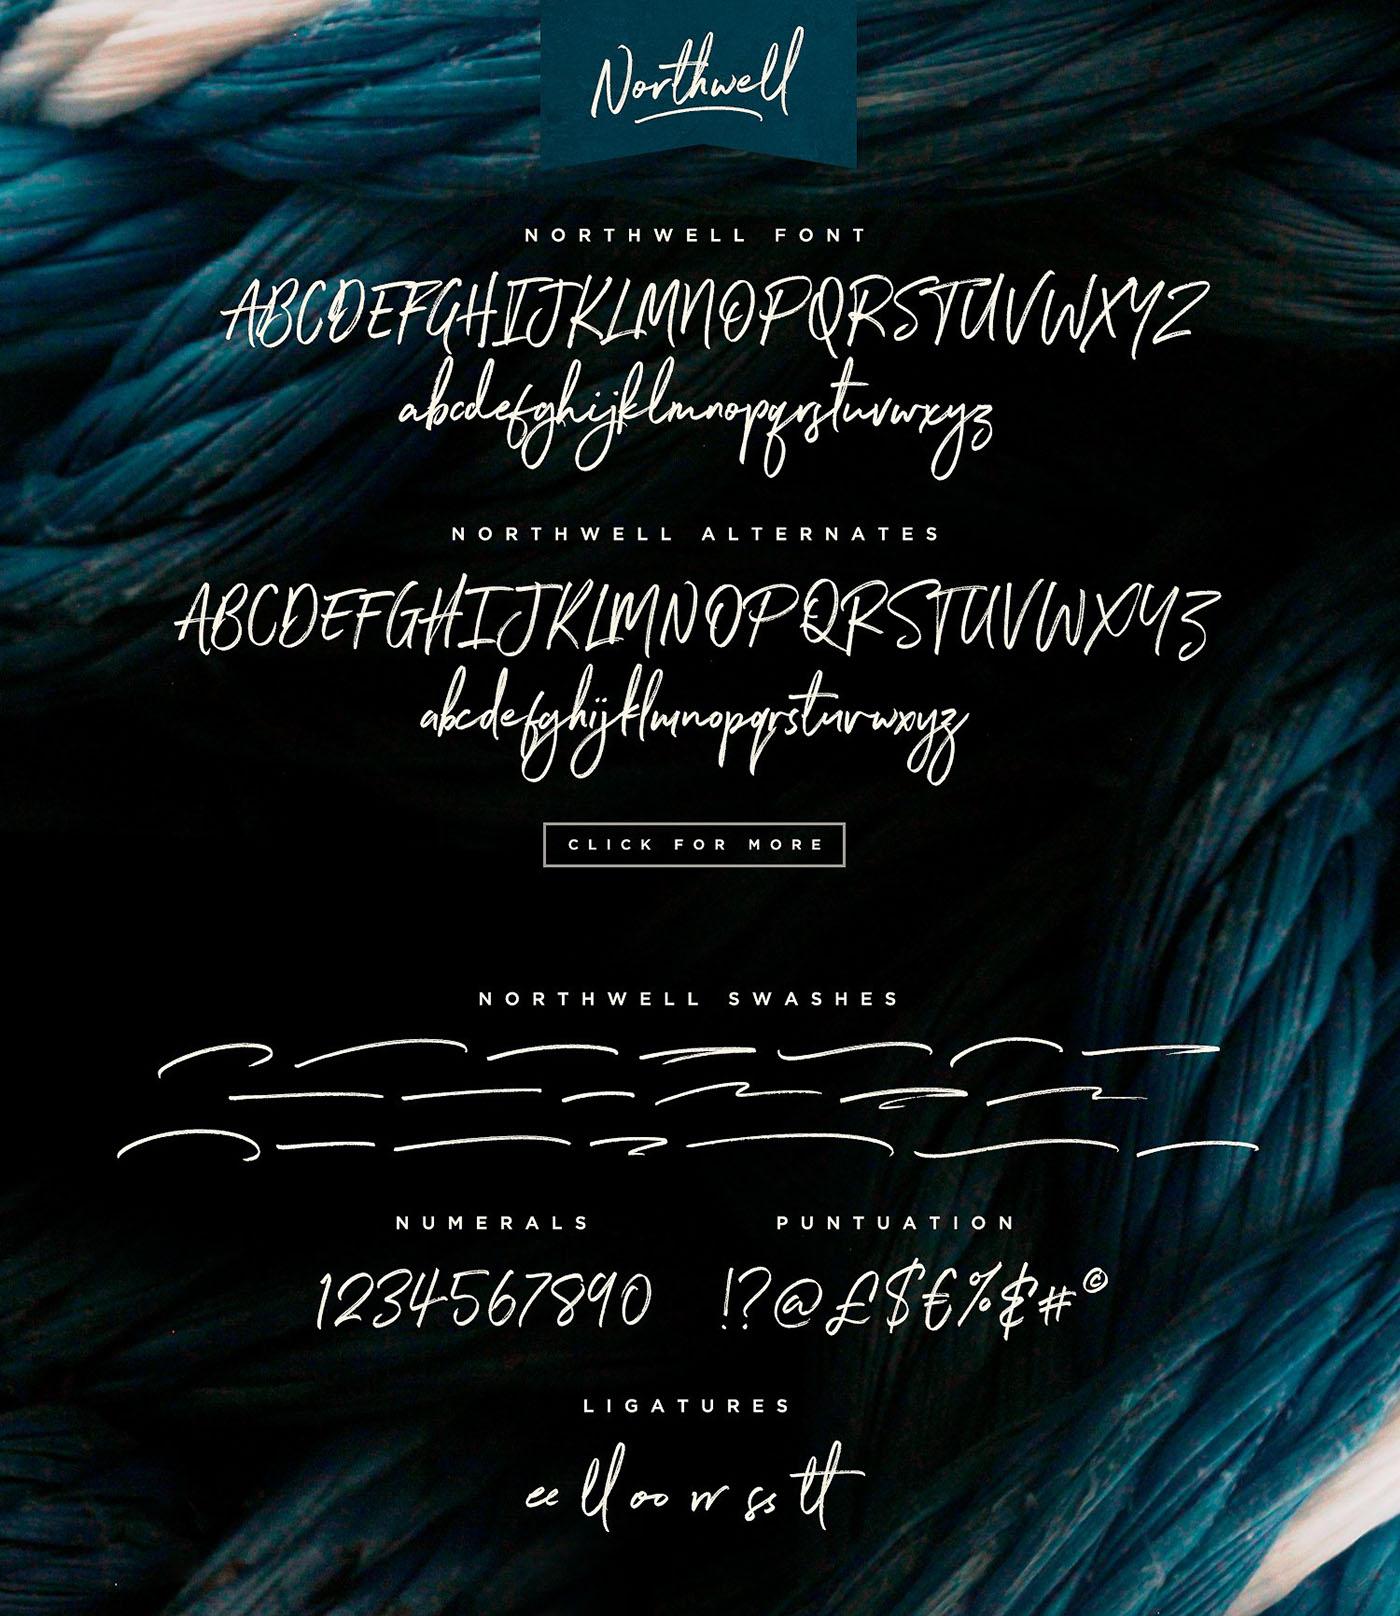 northwell font Northwell Handwritten Font on Behance